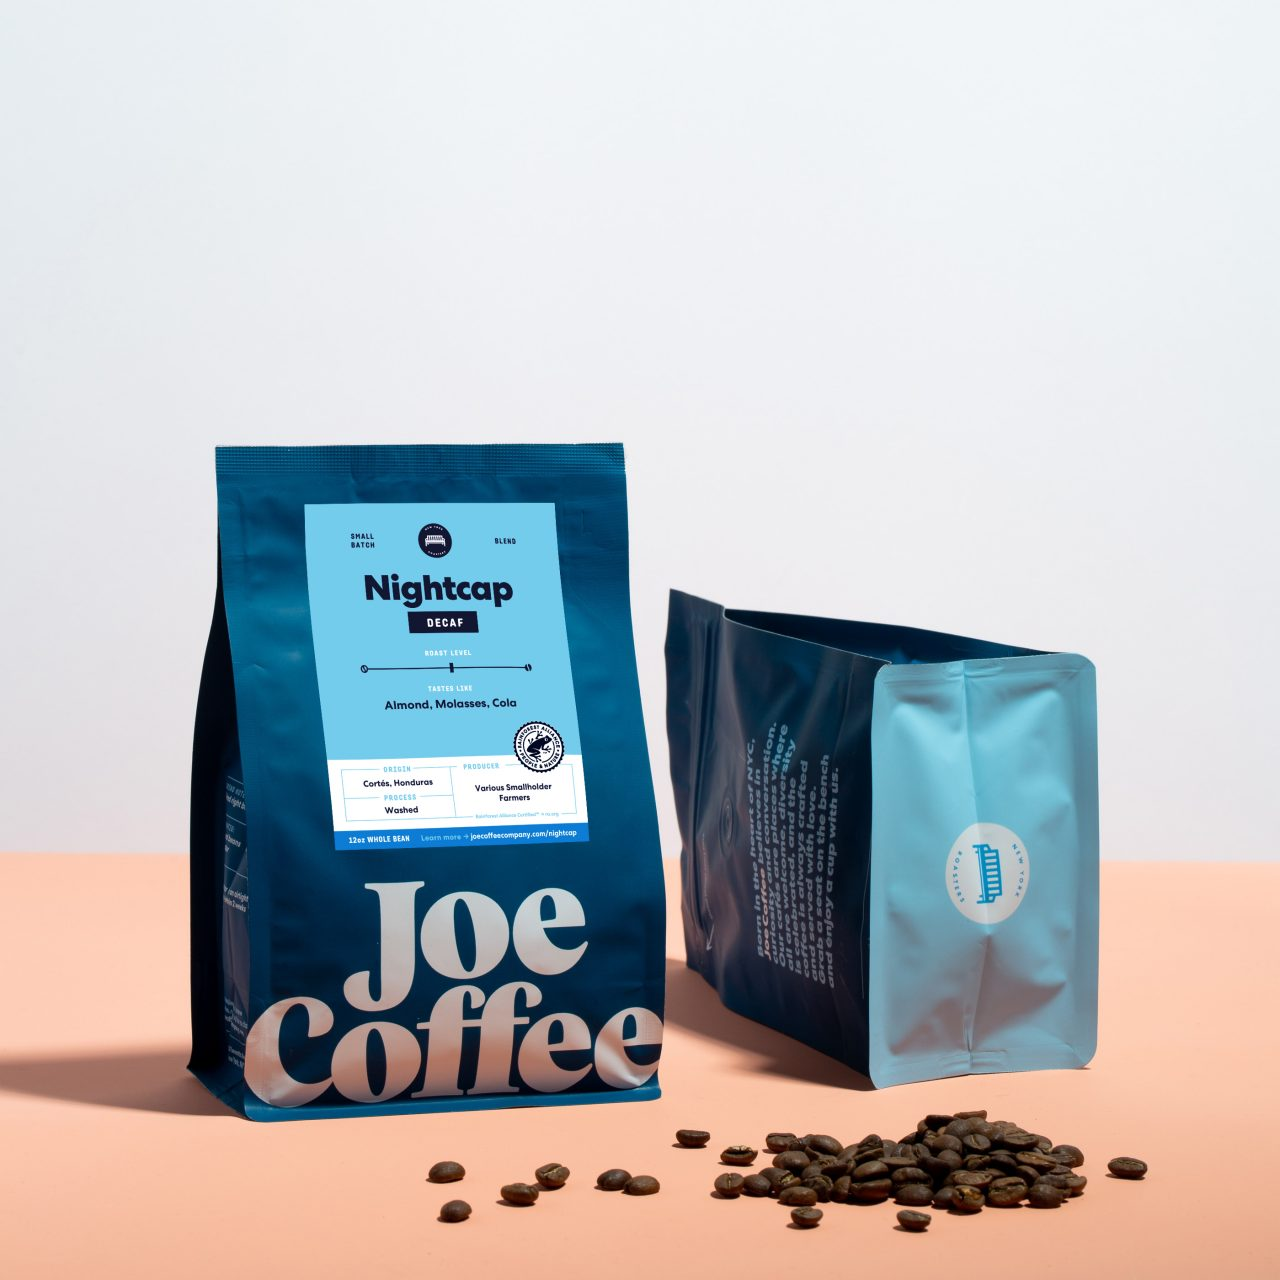 Nightcap Decaf Coffee Subscription